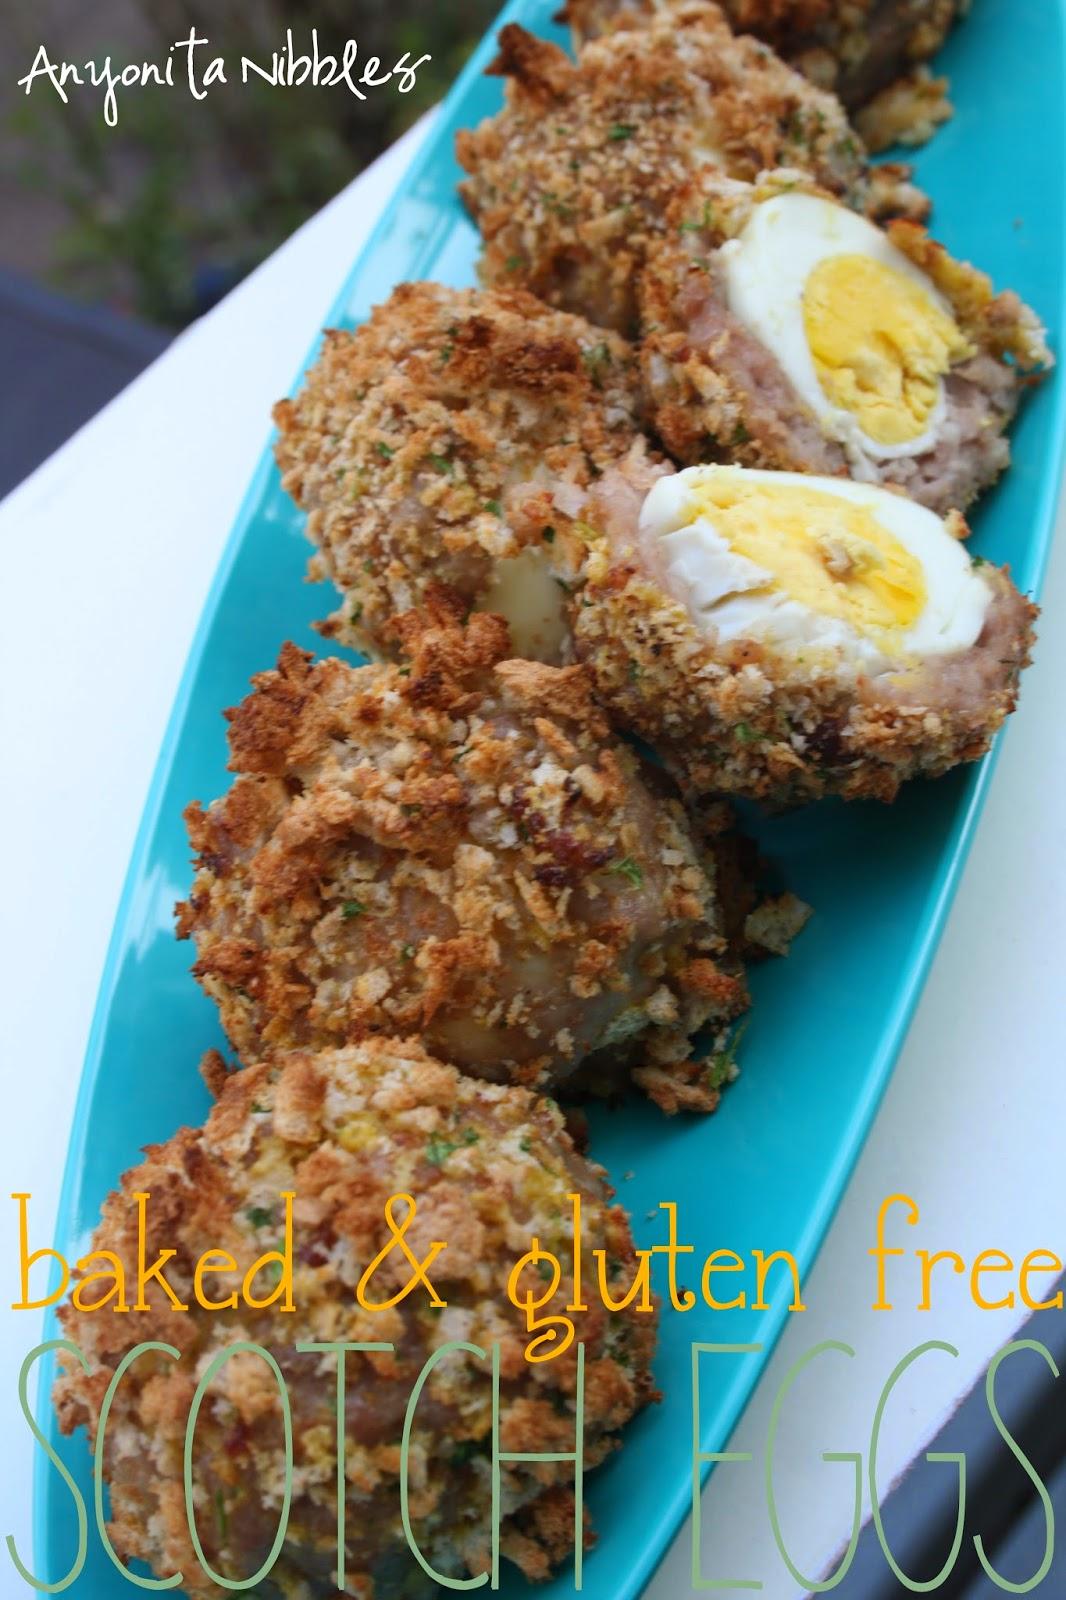 British picnic food: Scotch Eggs made Gluten Free from Anyonita Nibbles